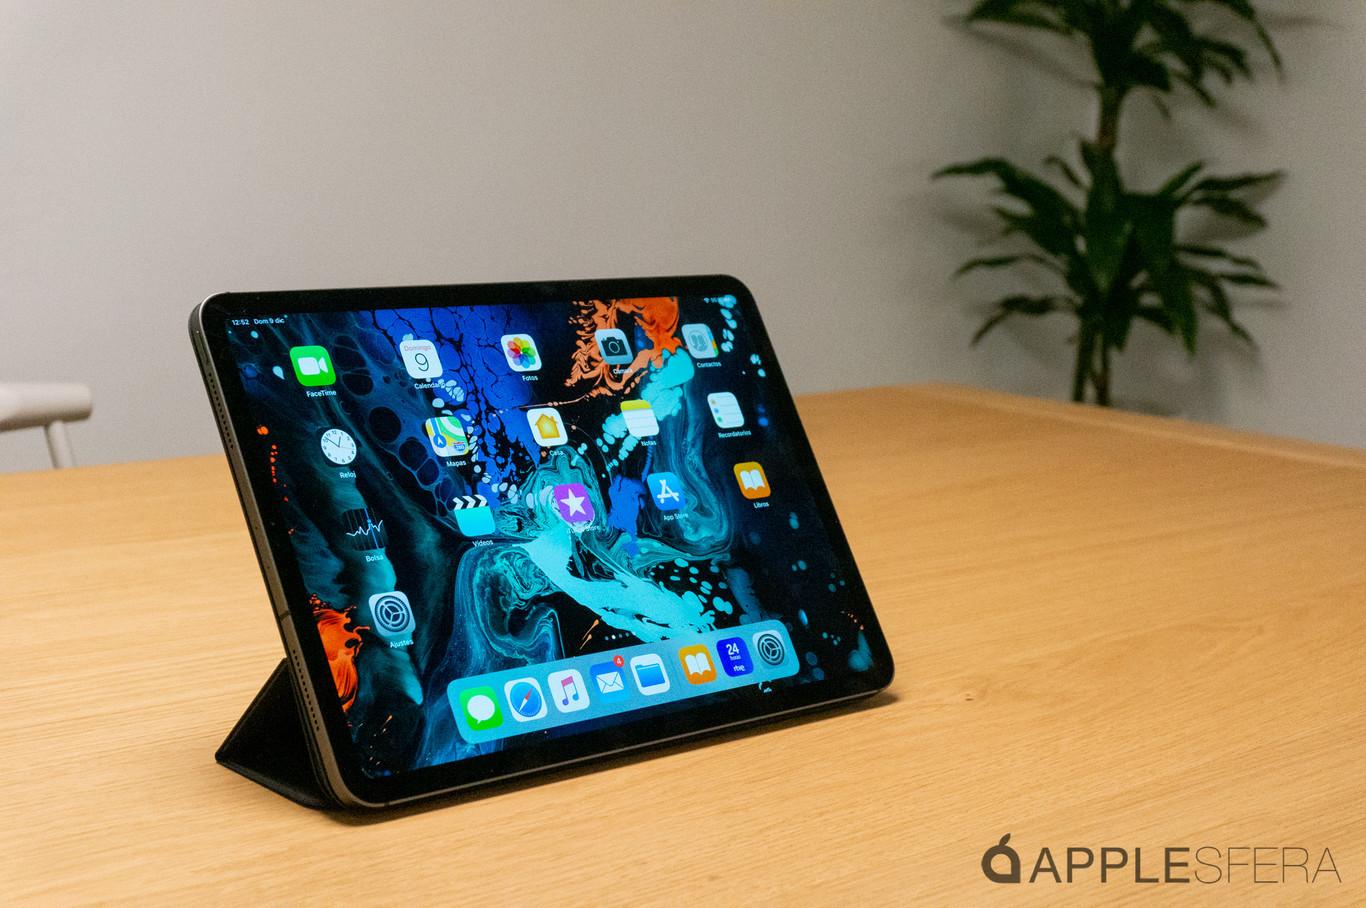 "iPhone 11 de 64 GB por 739 euros, iPad Pro de 11"" por 659 euros y AirPods con carga inalámbrica por 161..."